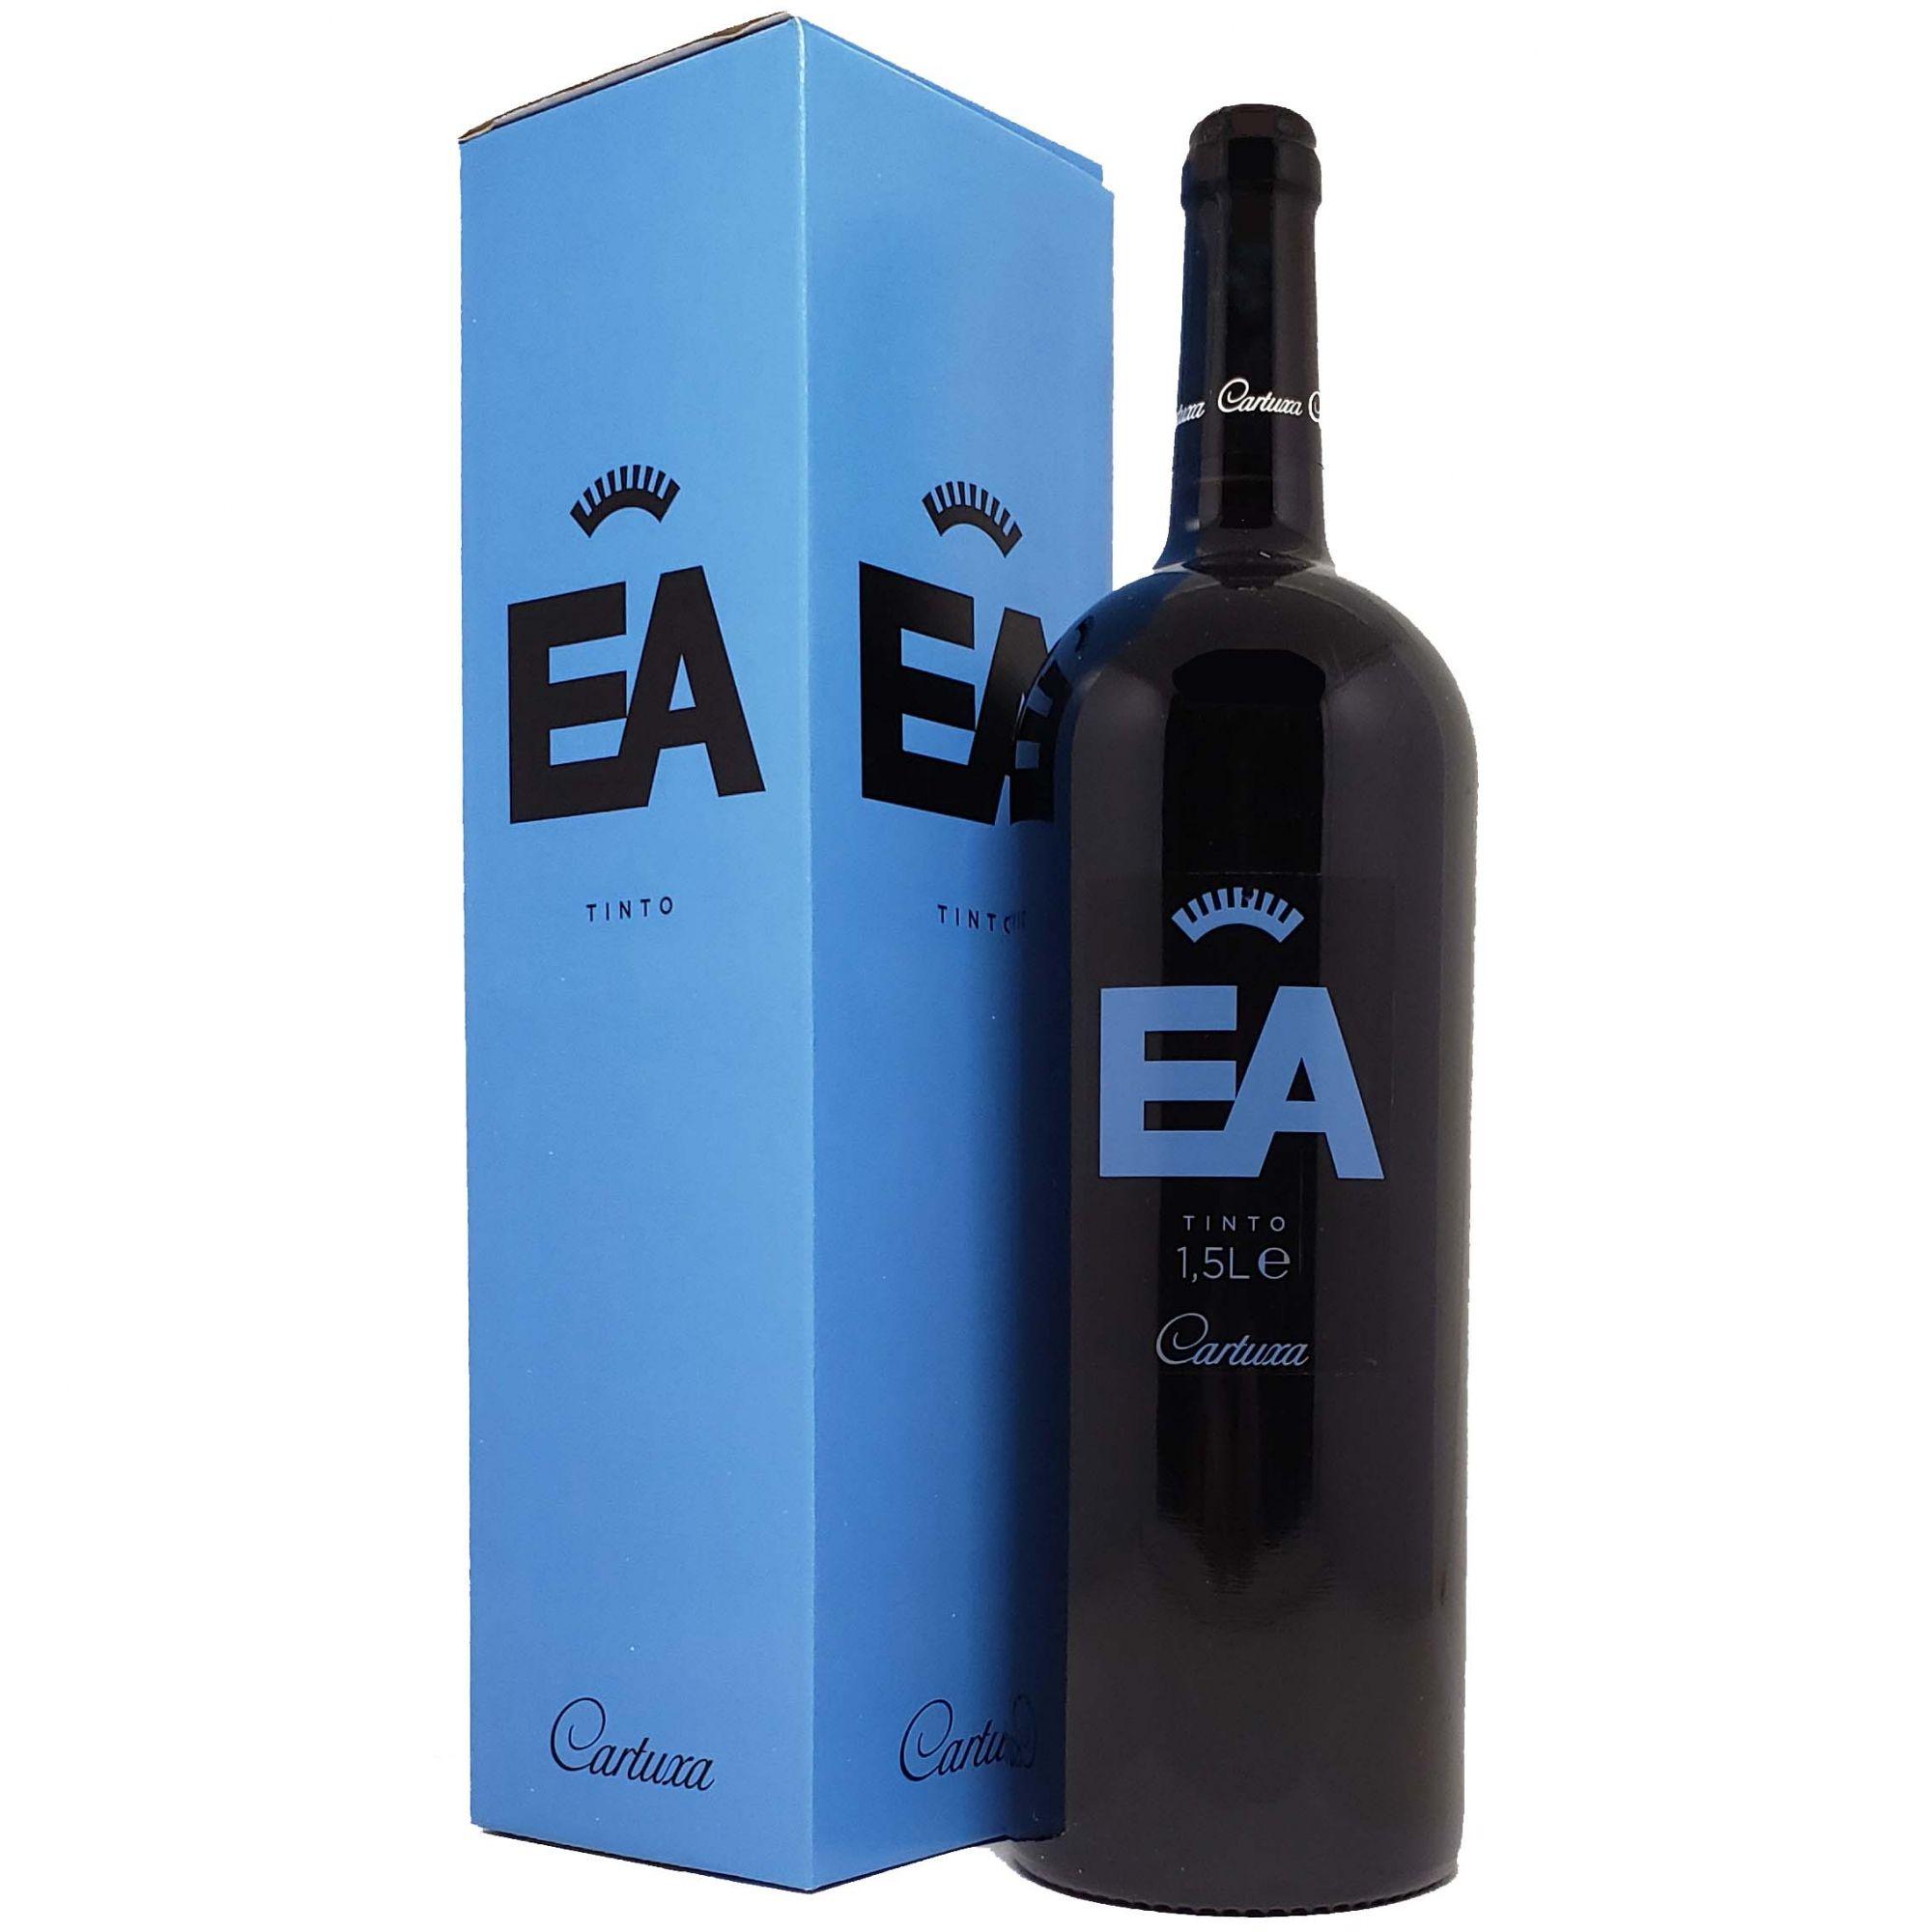 Vinho Tinto Cartuxa EA - 1,5L -